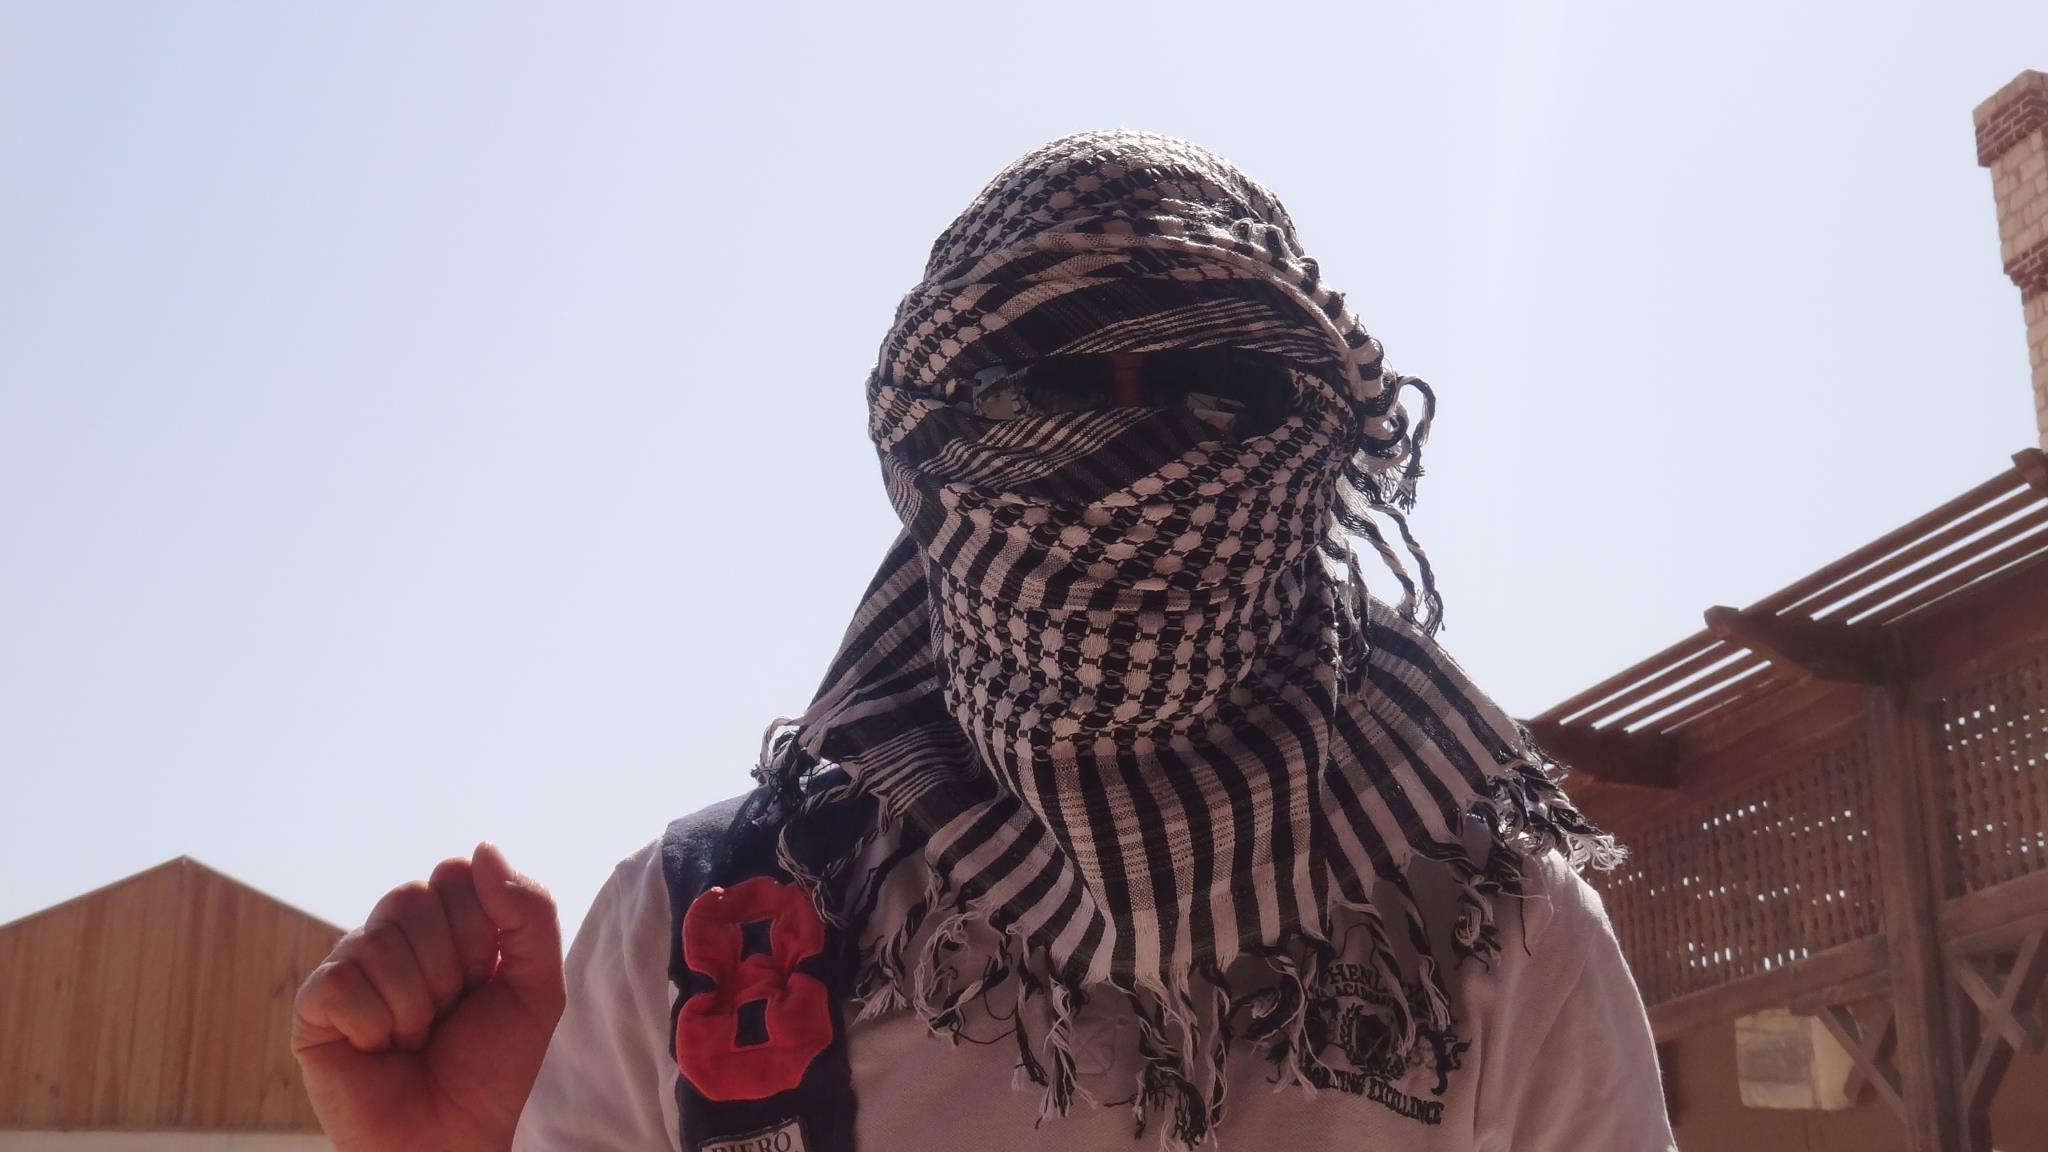 Planen schwule Linke in Ägypten Schlimmes gegen Berger?